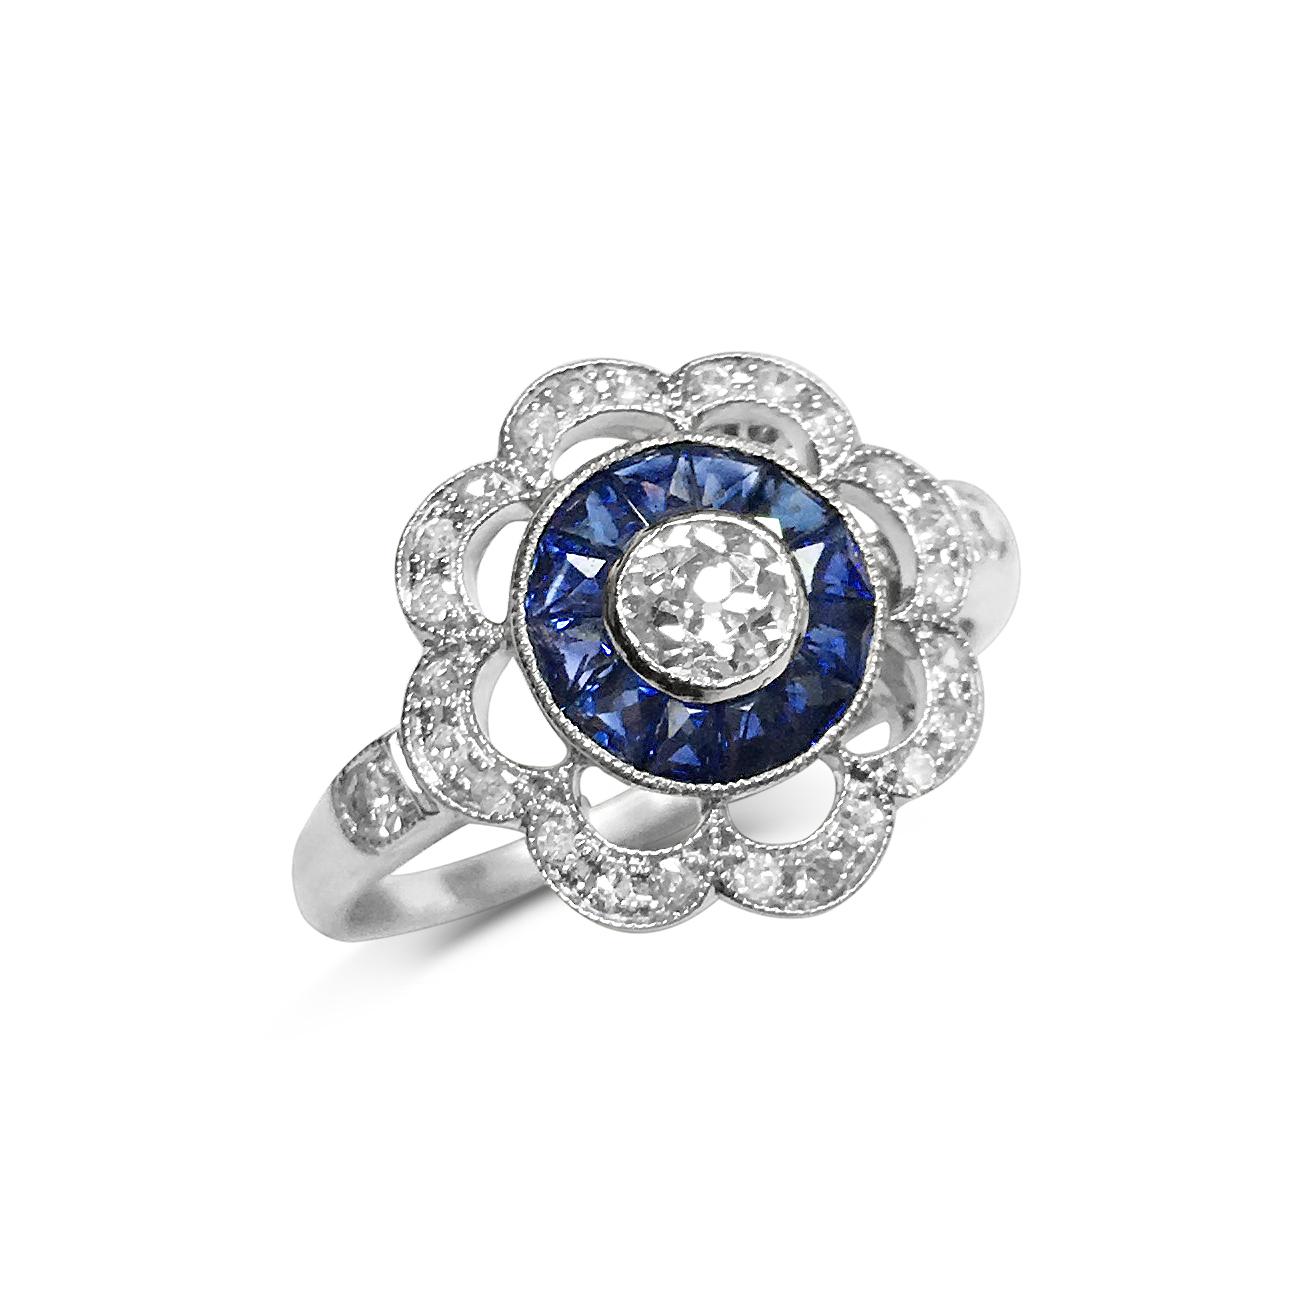 diamond-and-sapphire-rosette-shaped-target-ring-SN92-1.jpg